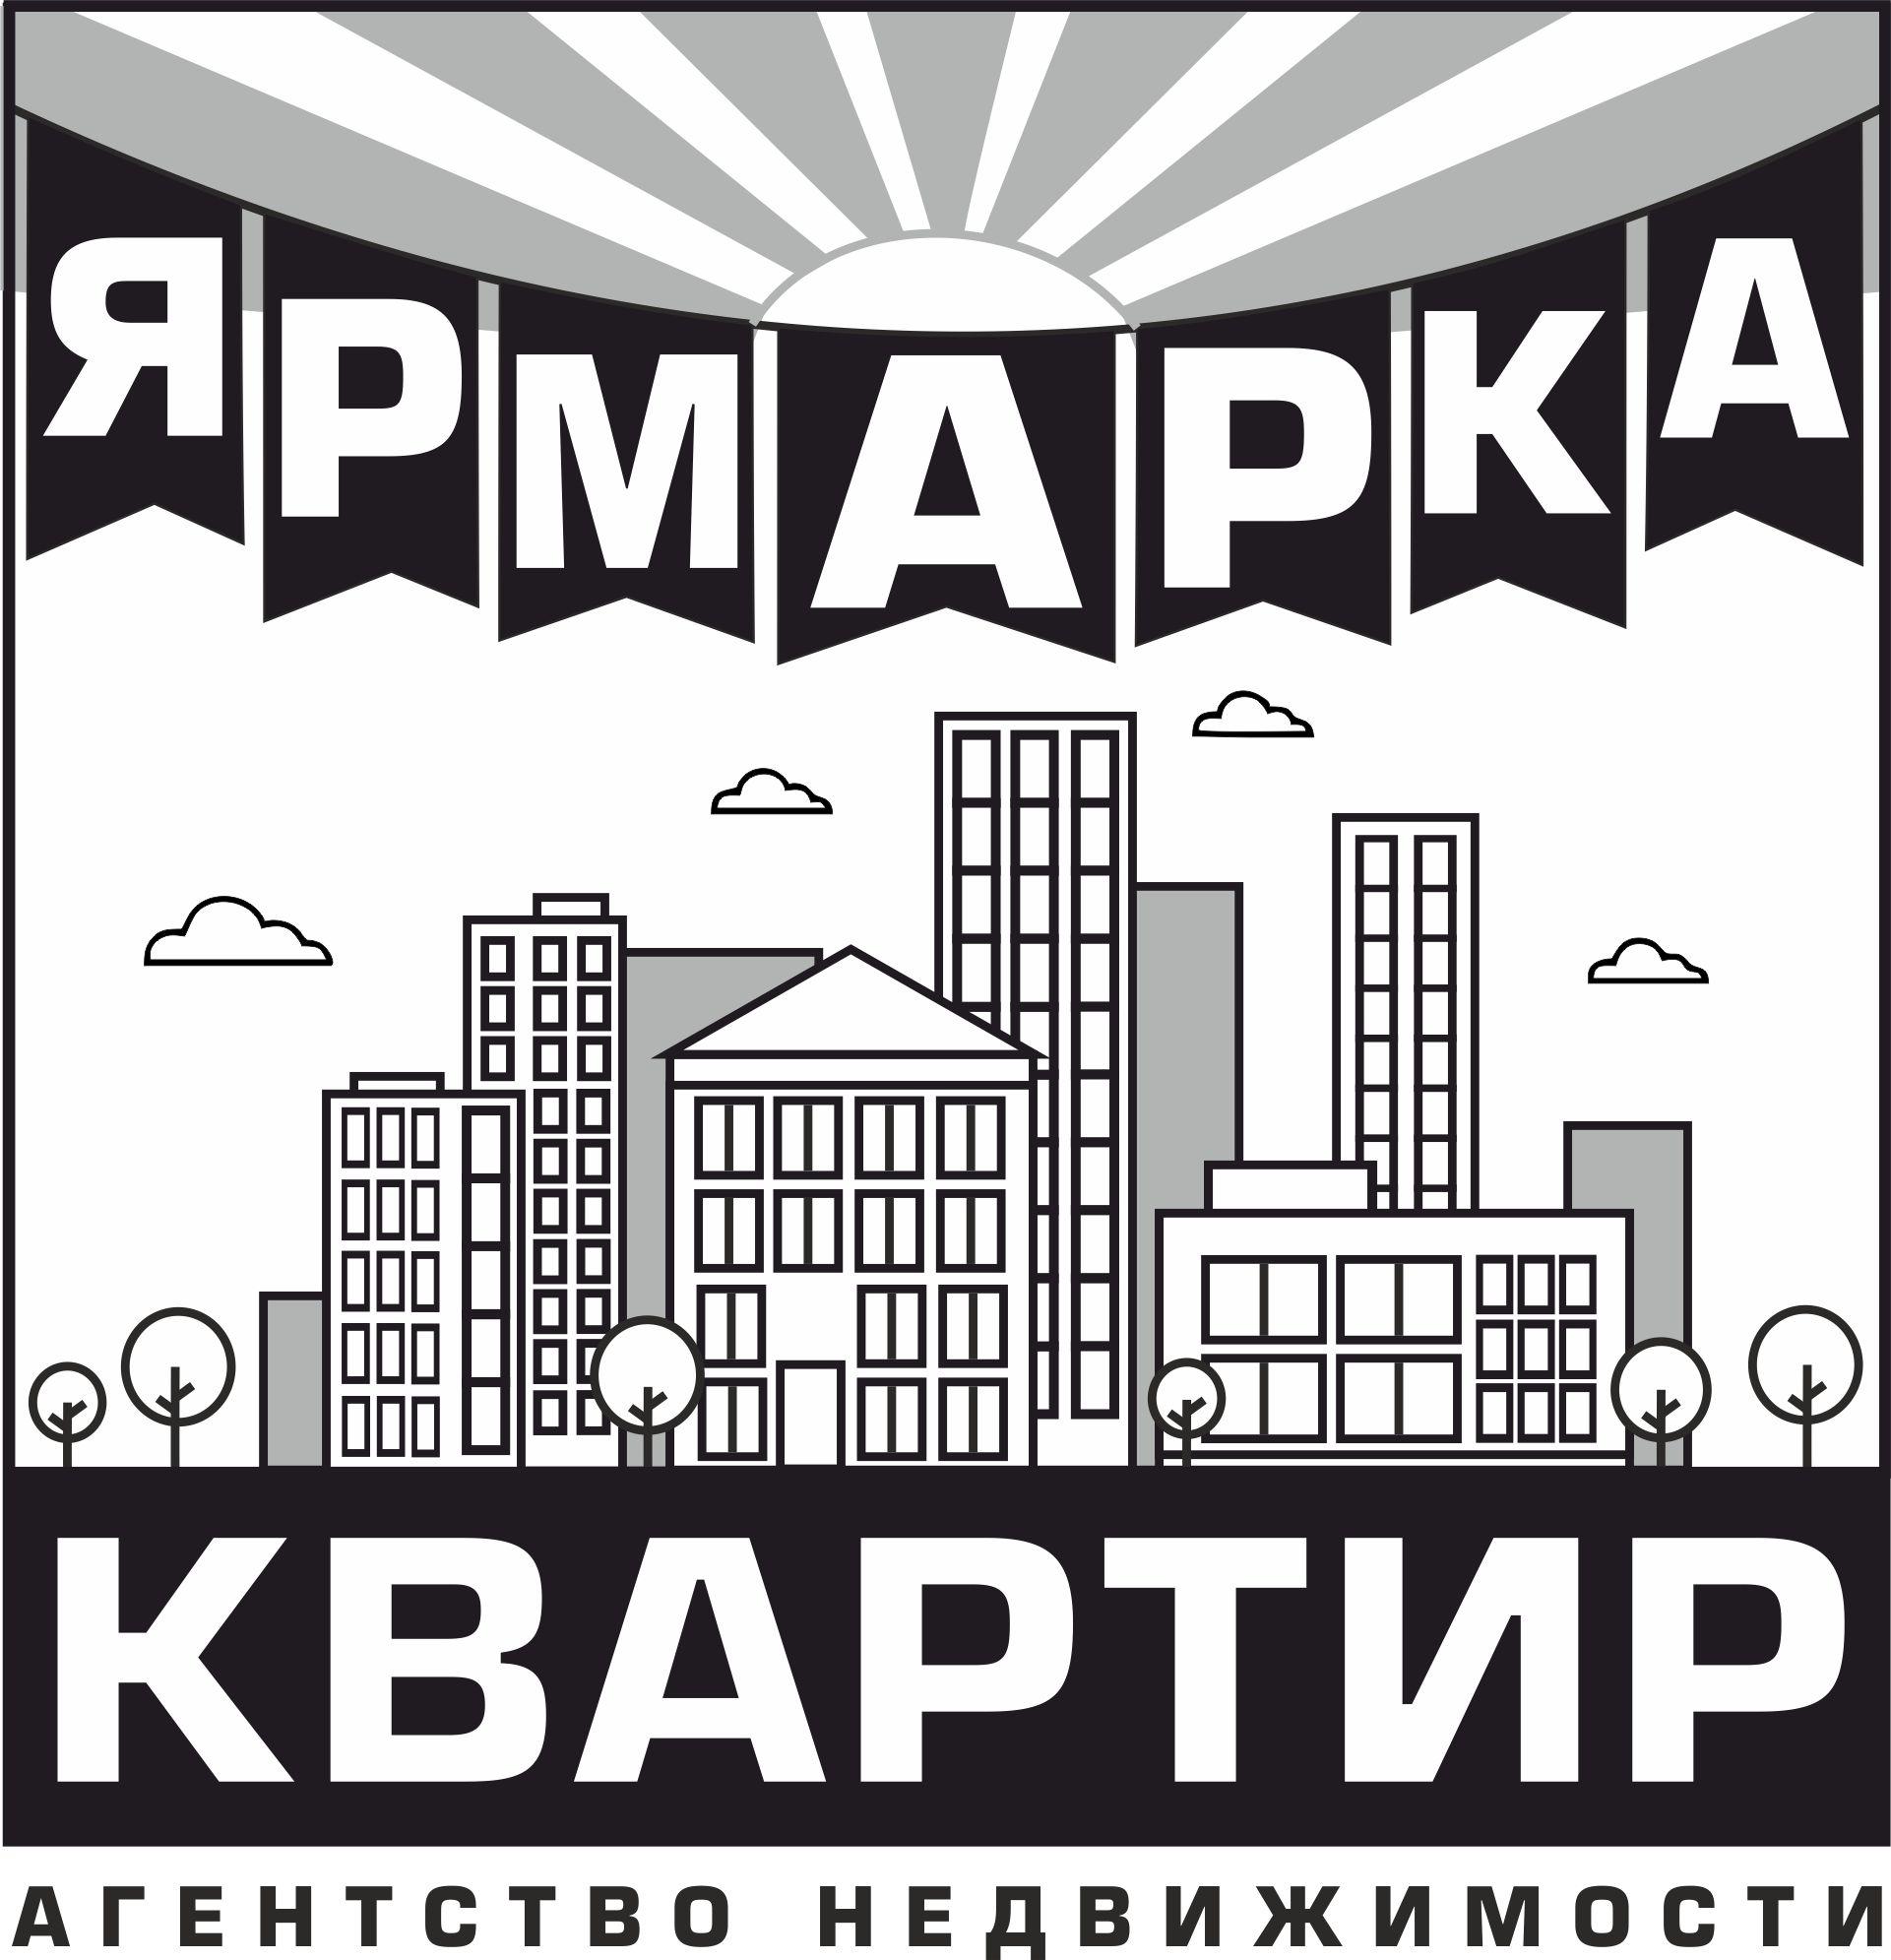 Создание логотипа, с вариантами для визитки и листовки фото f_88260085a17b30f8.jpg